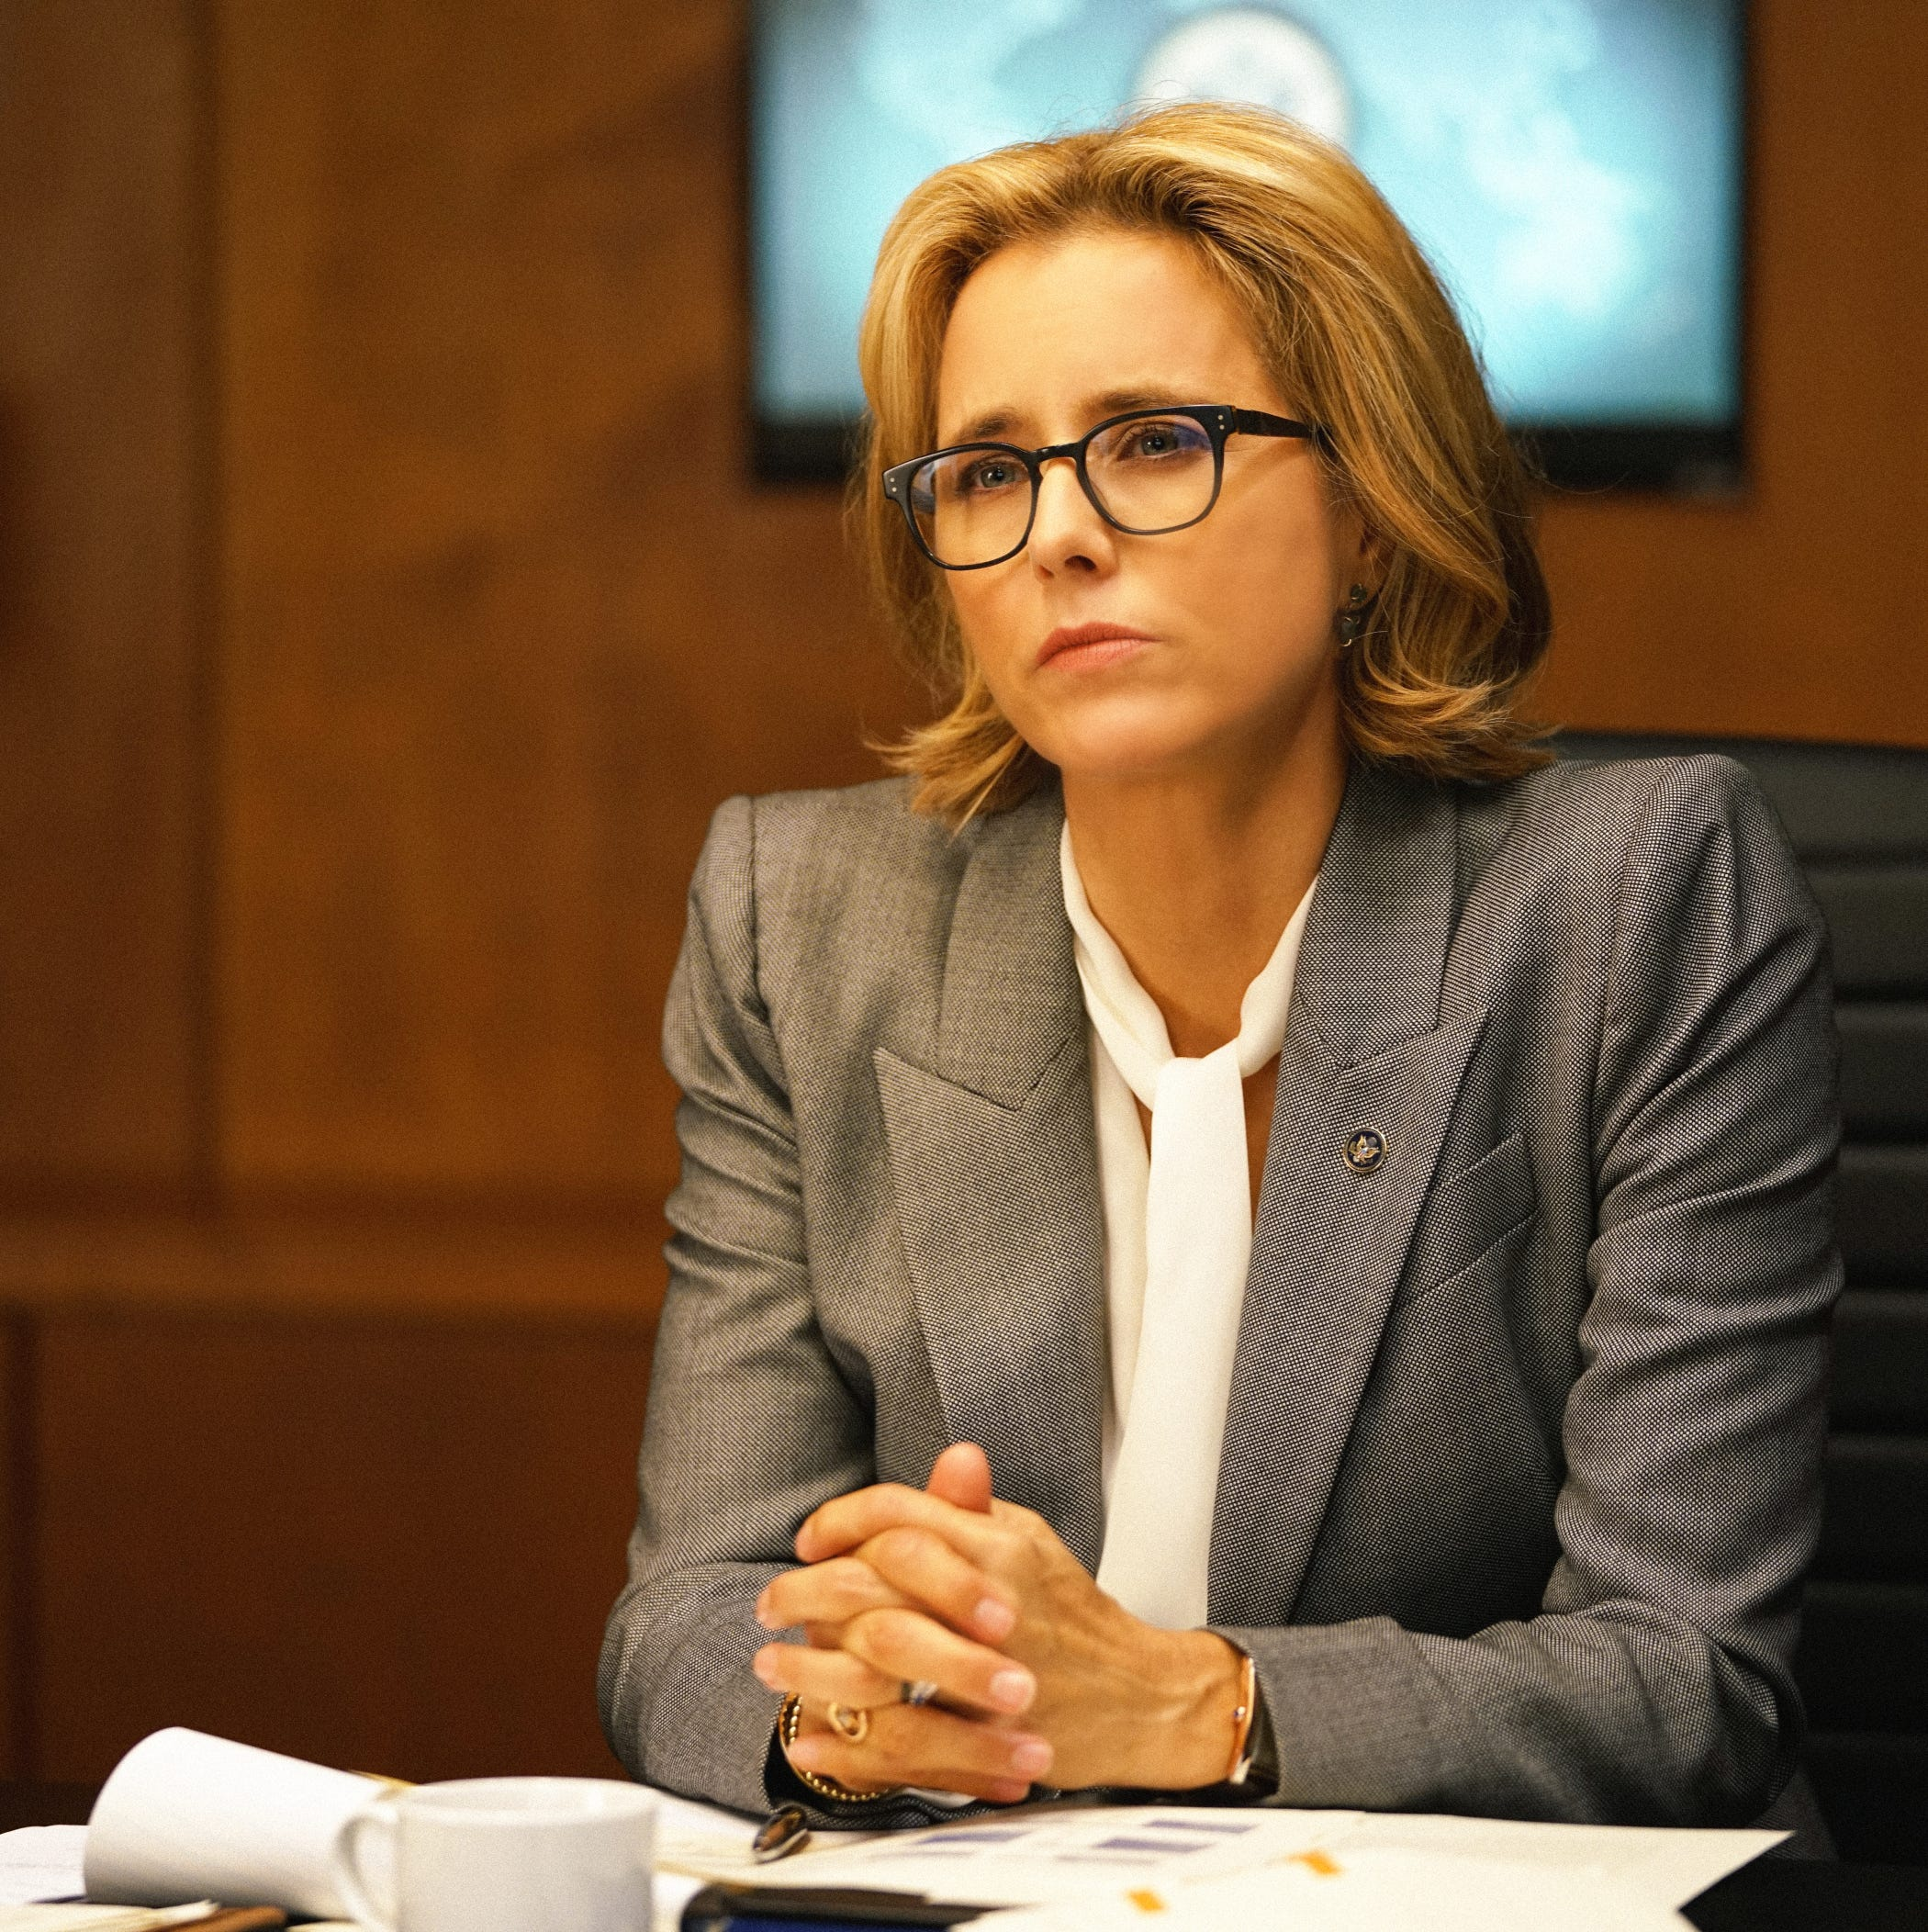 """Madam Secretary"" (CBS, 2014-present): Tea Leoni is Elizabeth Adams McCord, the United States Secretary of State who  advises the President on international issues."